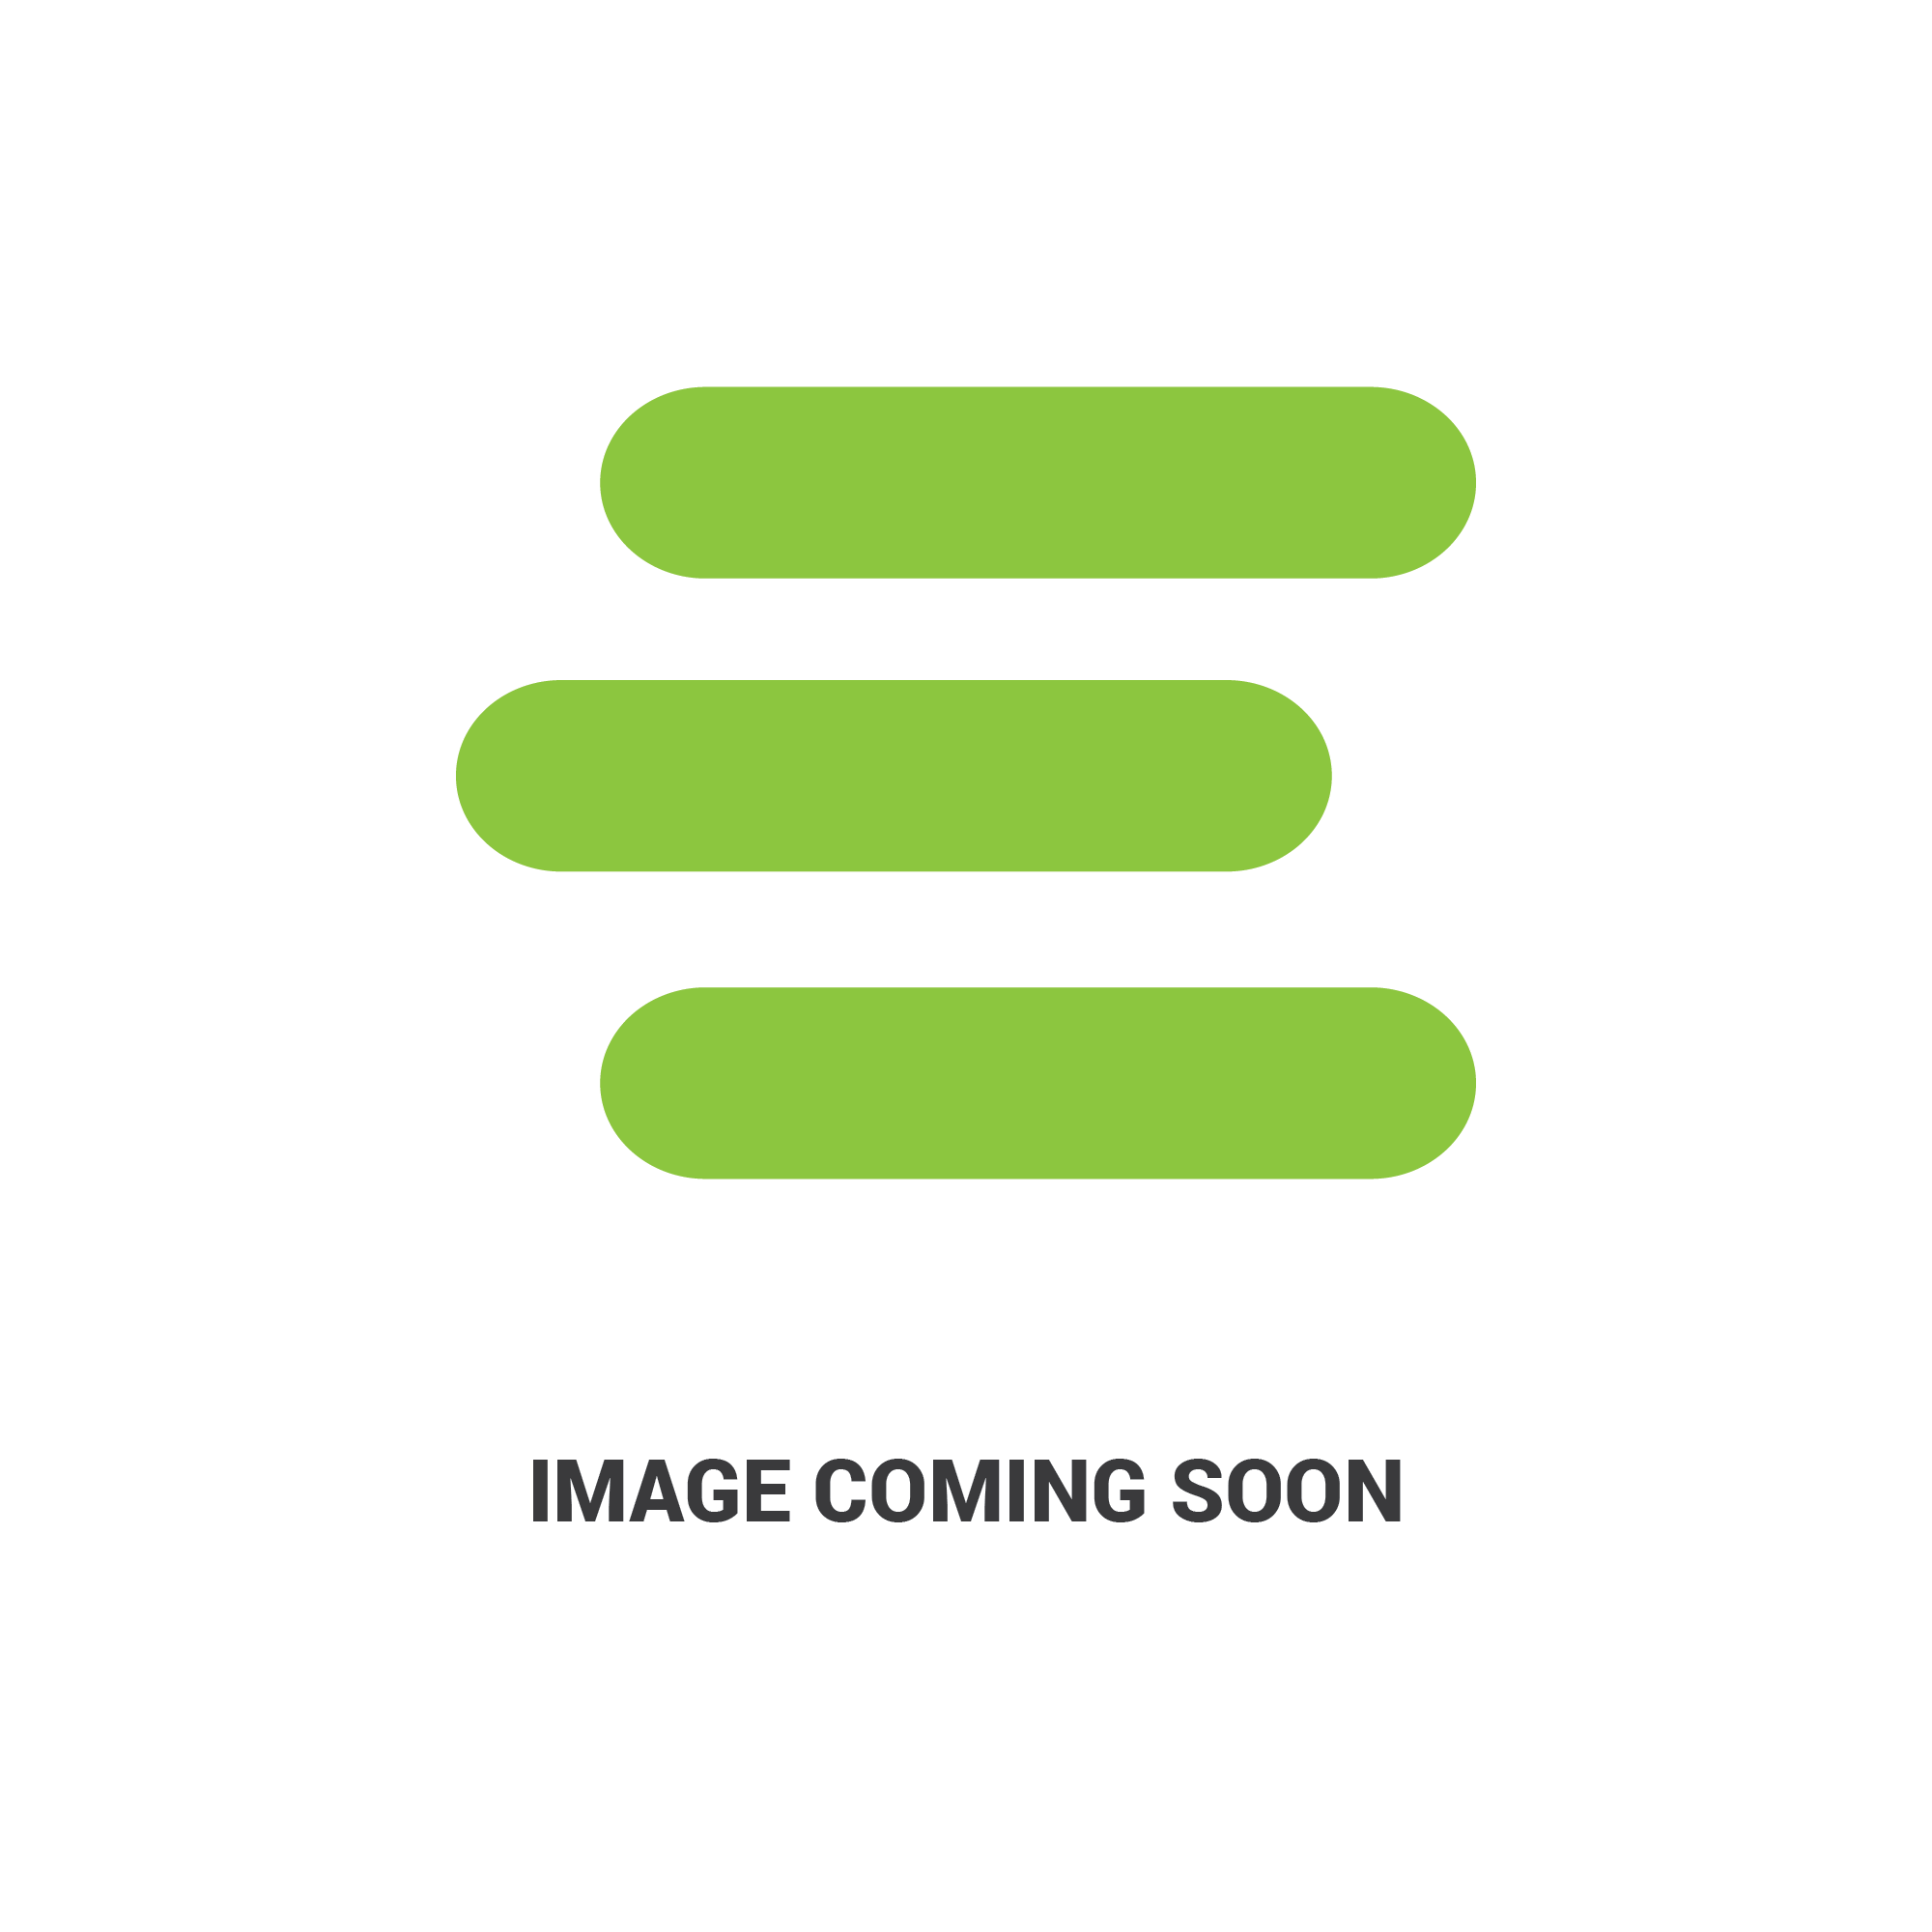 E-15841-39010edit 1.jpg